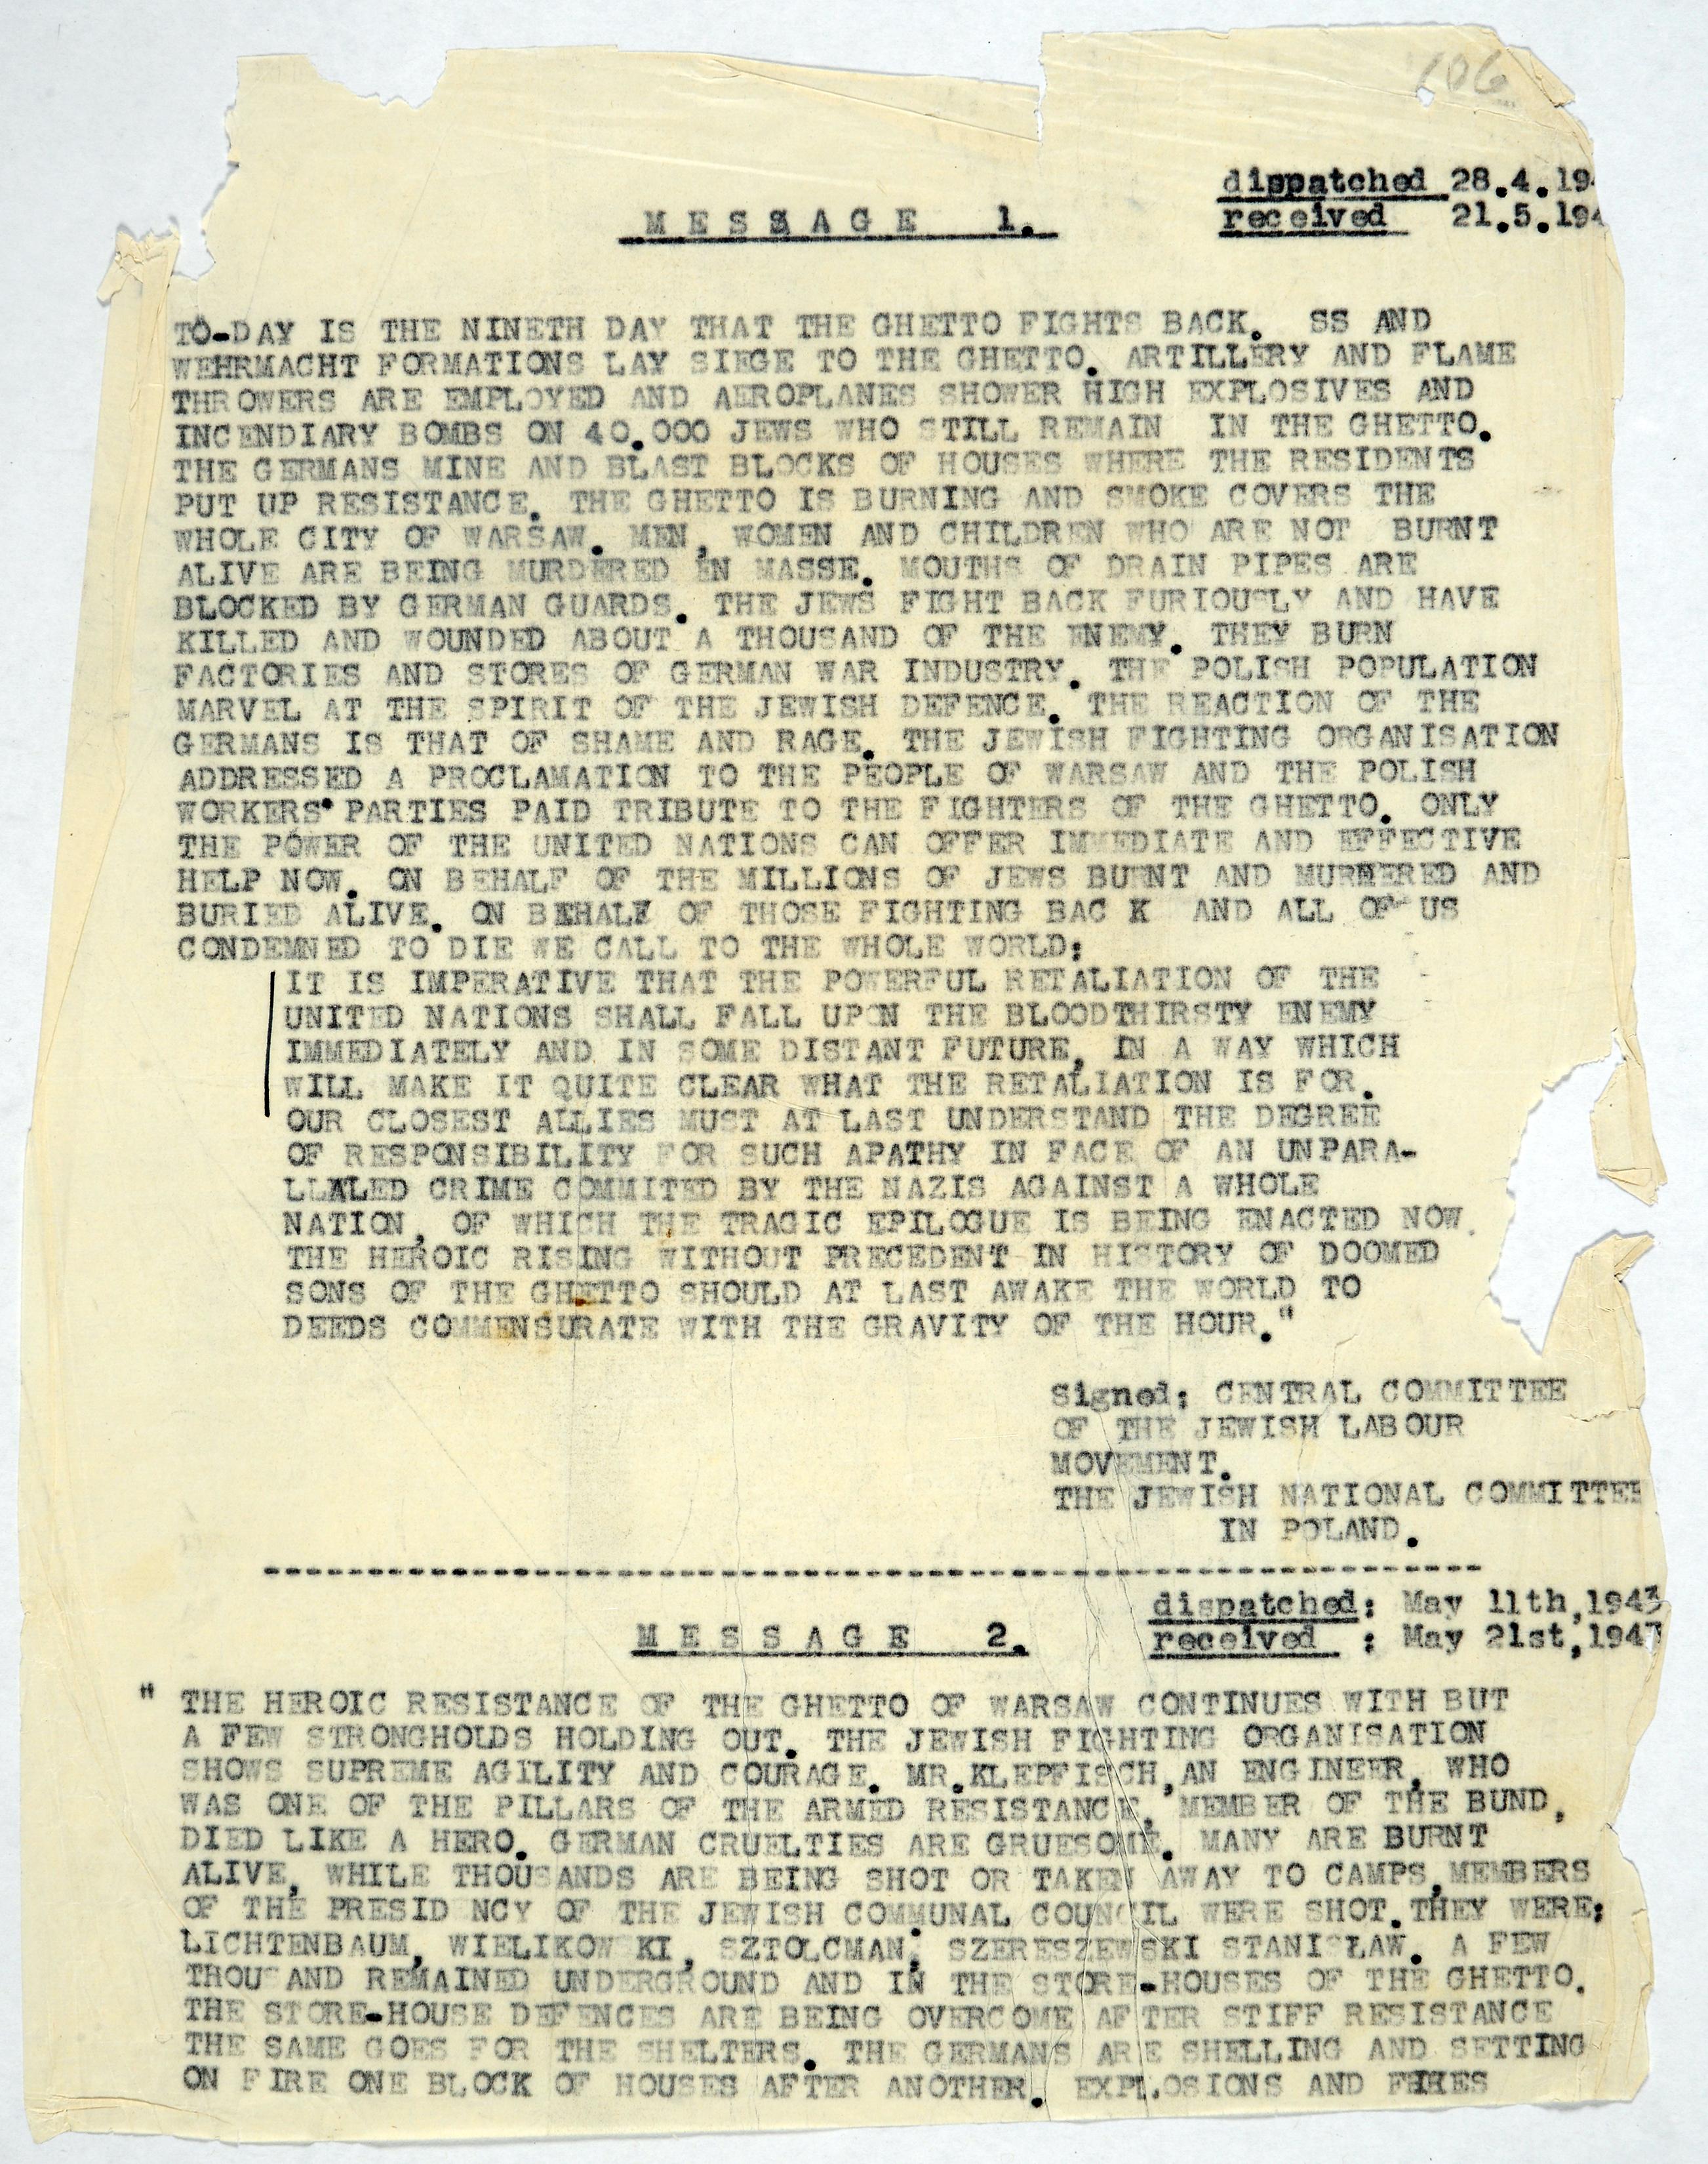 Description of the uprising in the Warsaw Ghetto